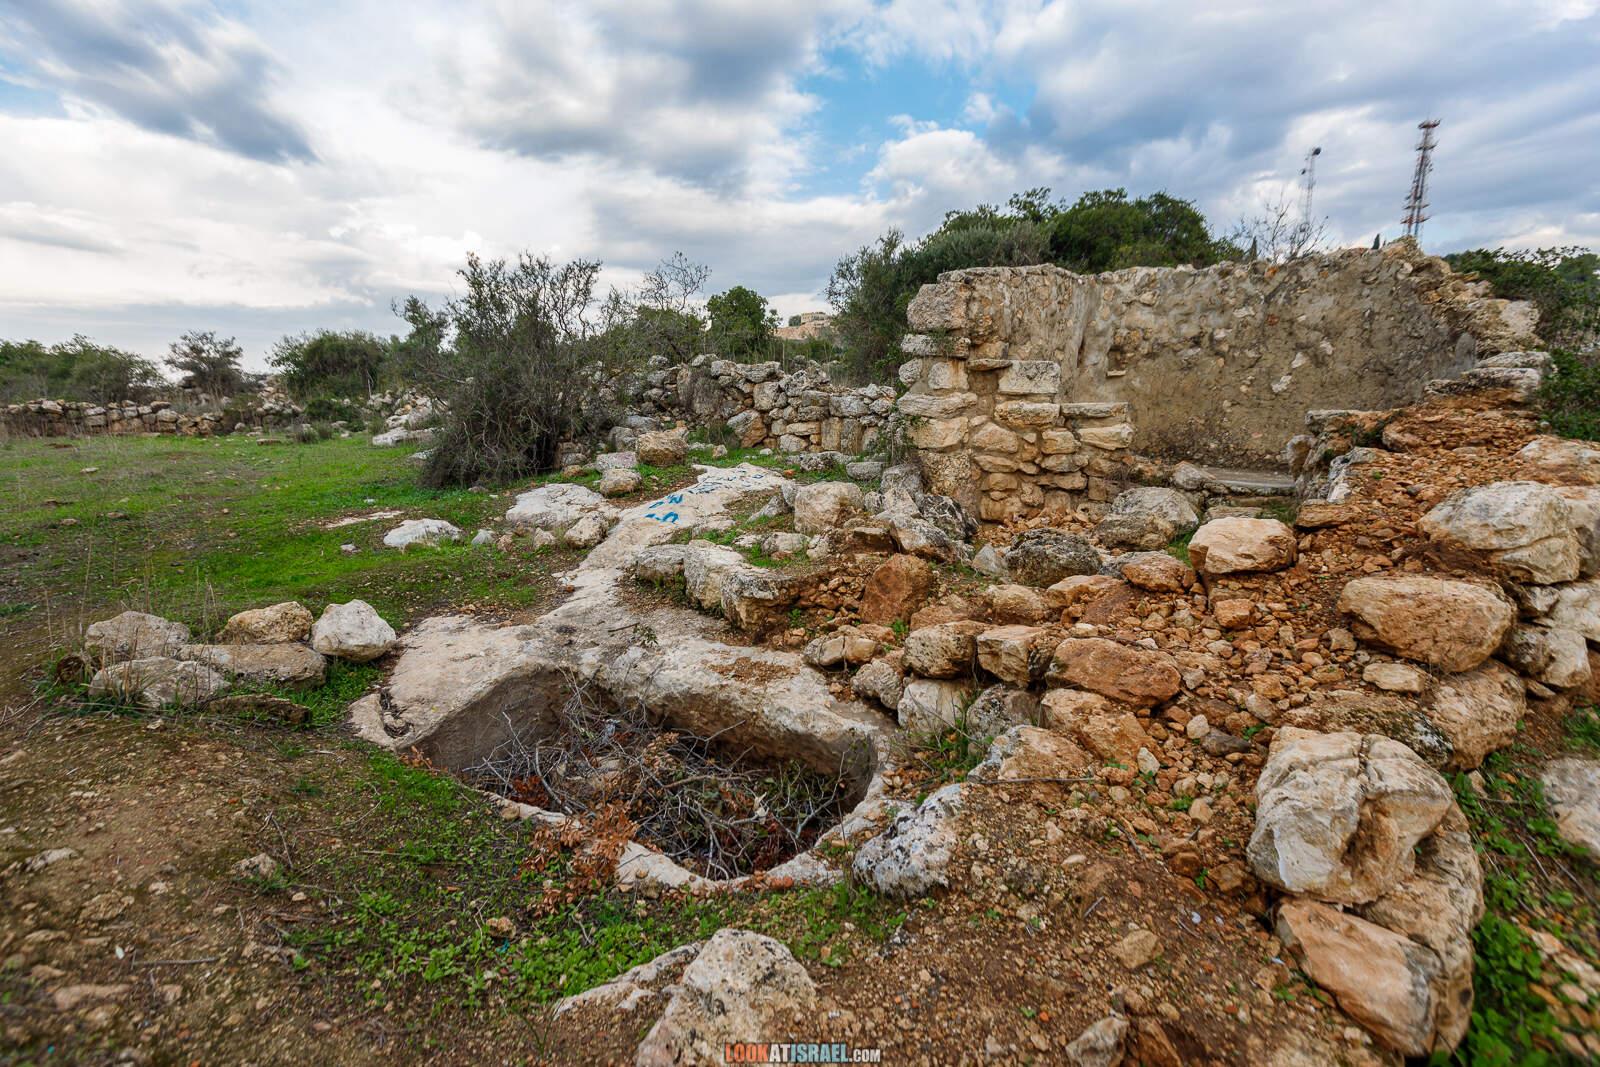 Гора Кармила и ручей Кислон (Кисалон) | מסלול בהר כרמילה ונחל קסלון